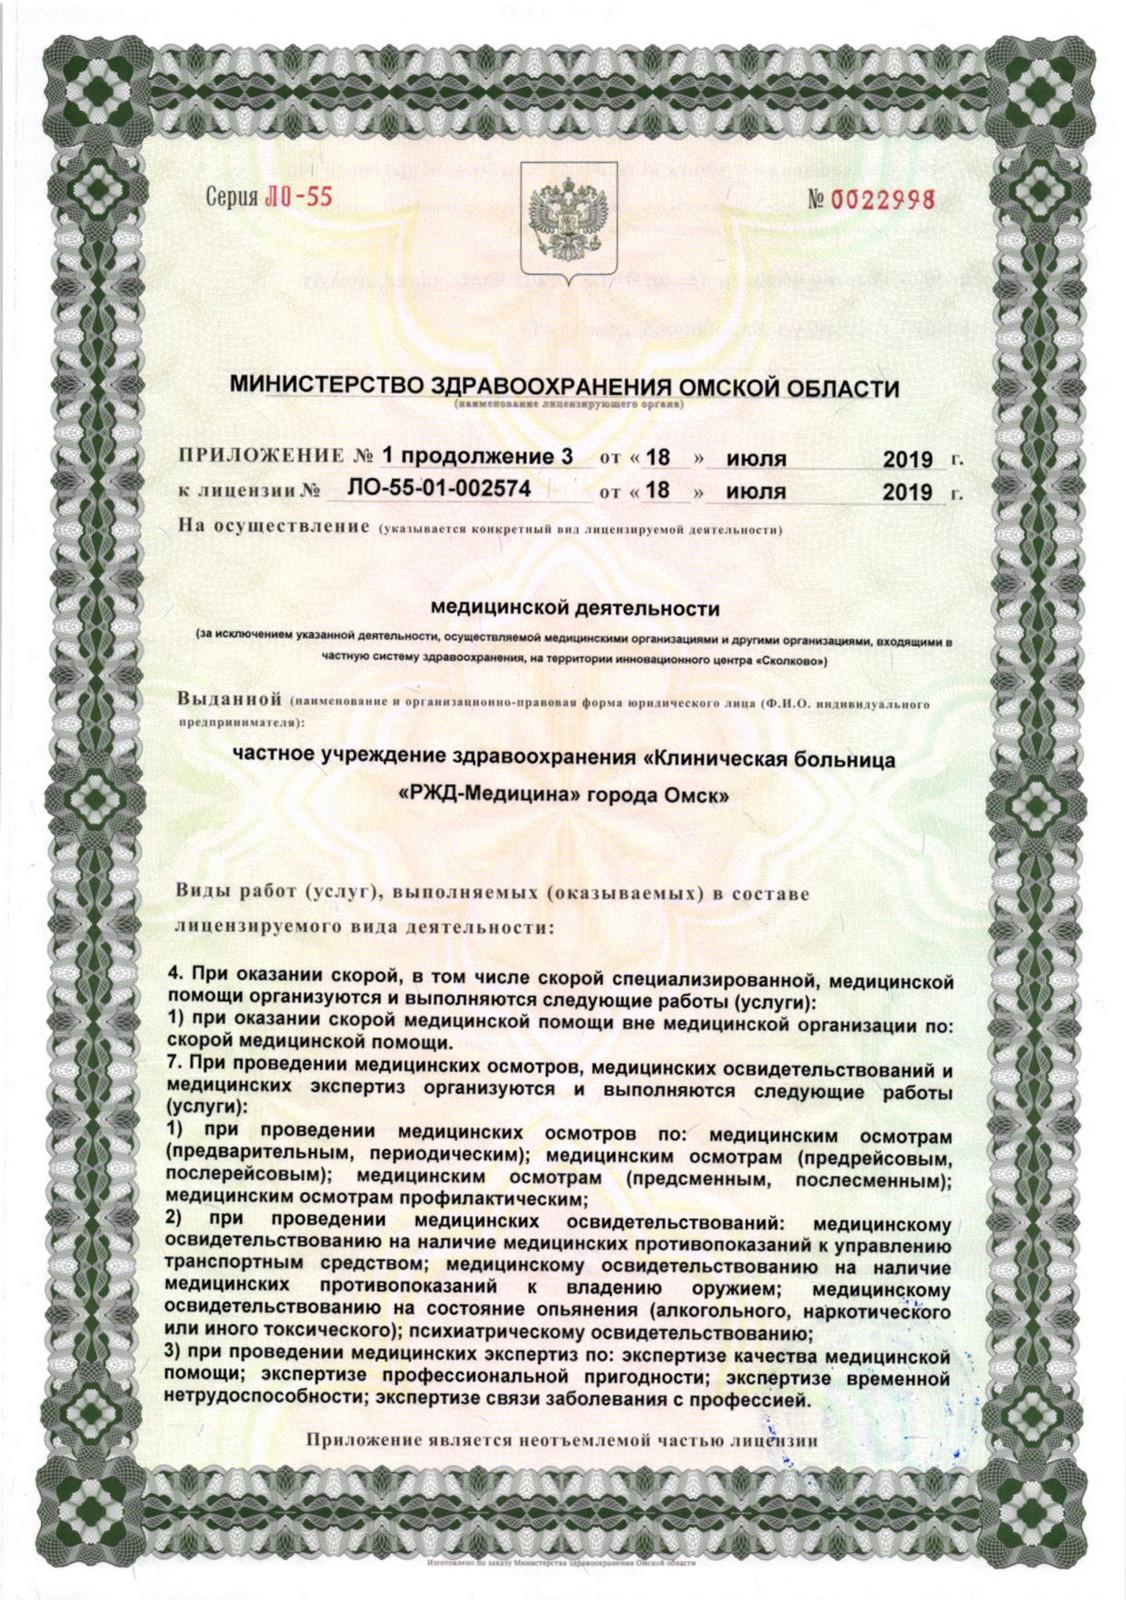 License-2019-07-18_17